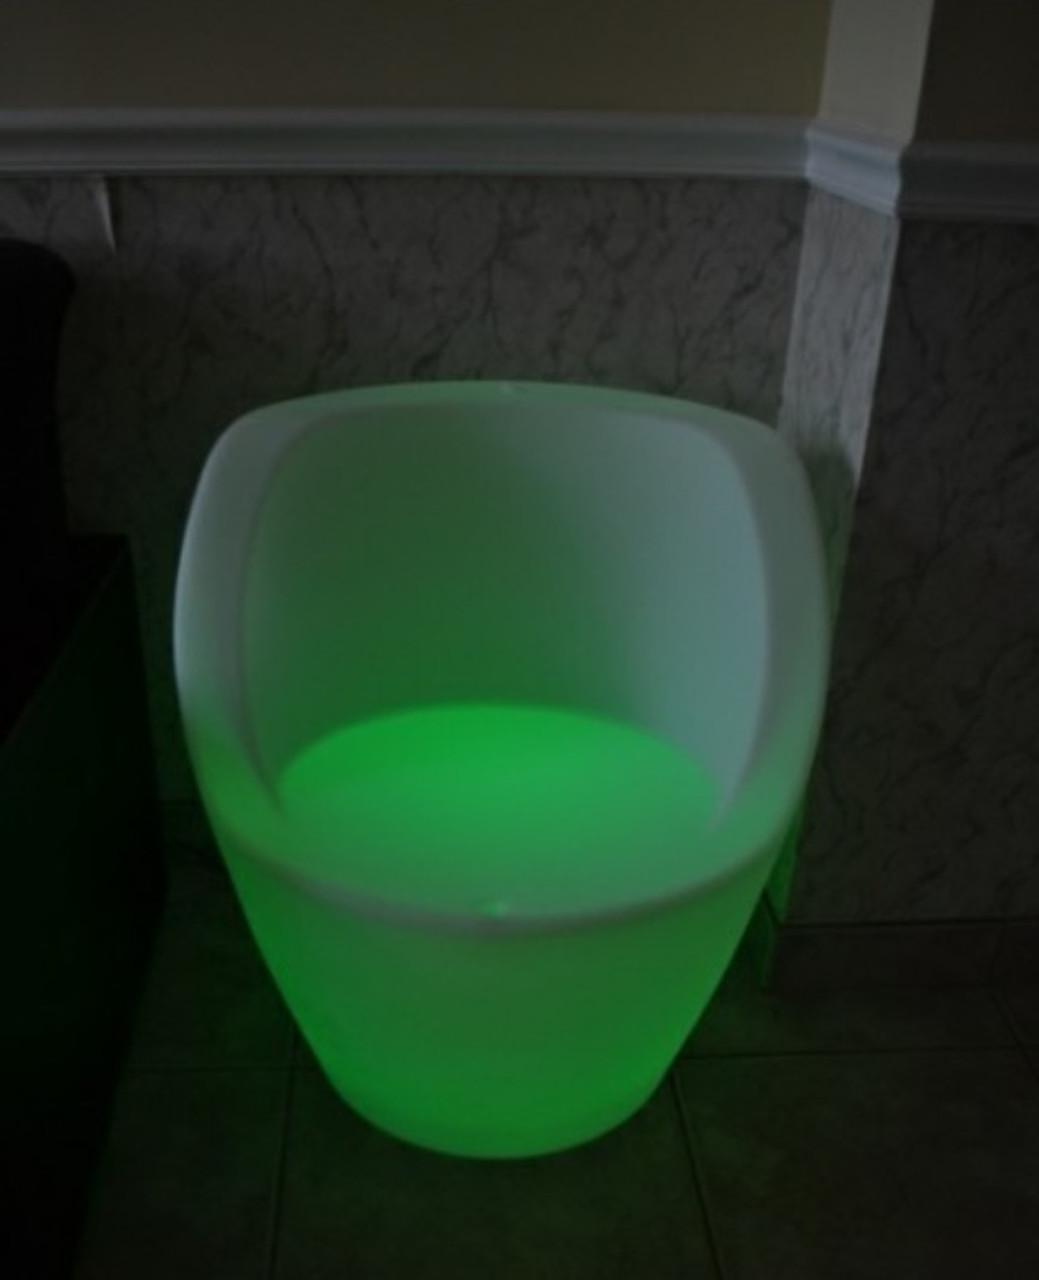 Led chair, patio decoration, garden decoration, led furniture, led stool, led cube, light up cube